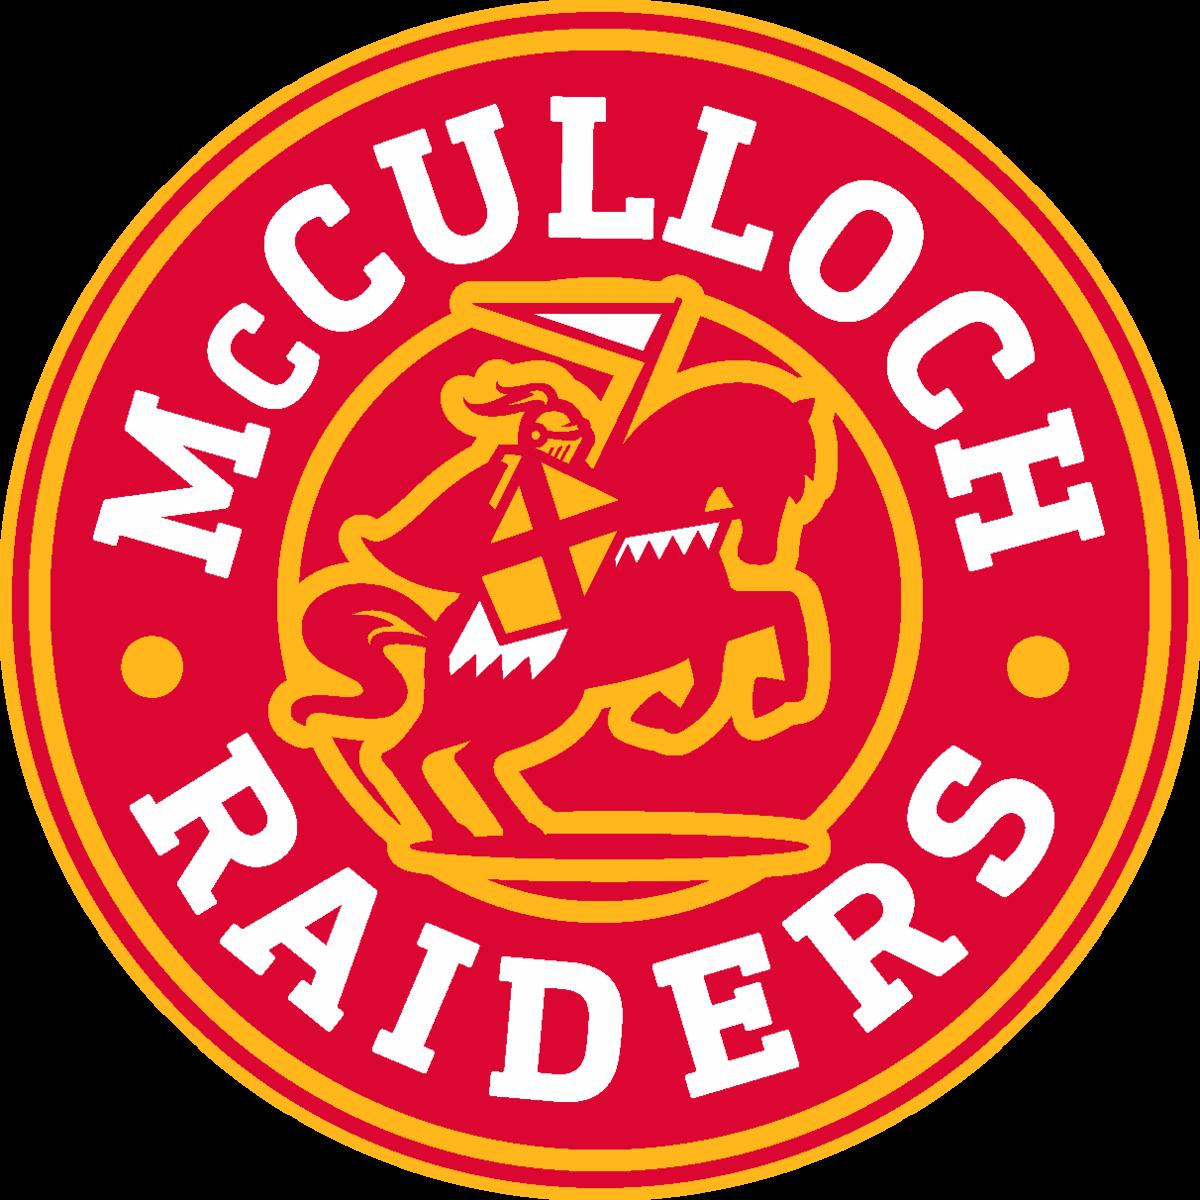 McCulloch Raiders logo